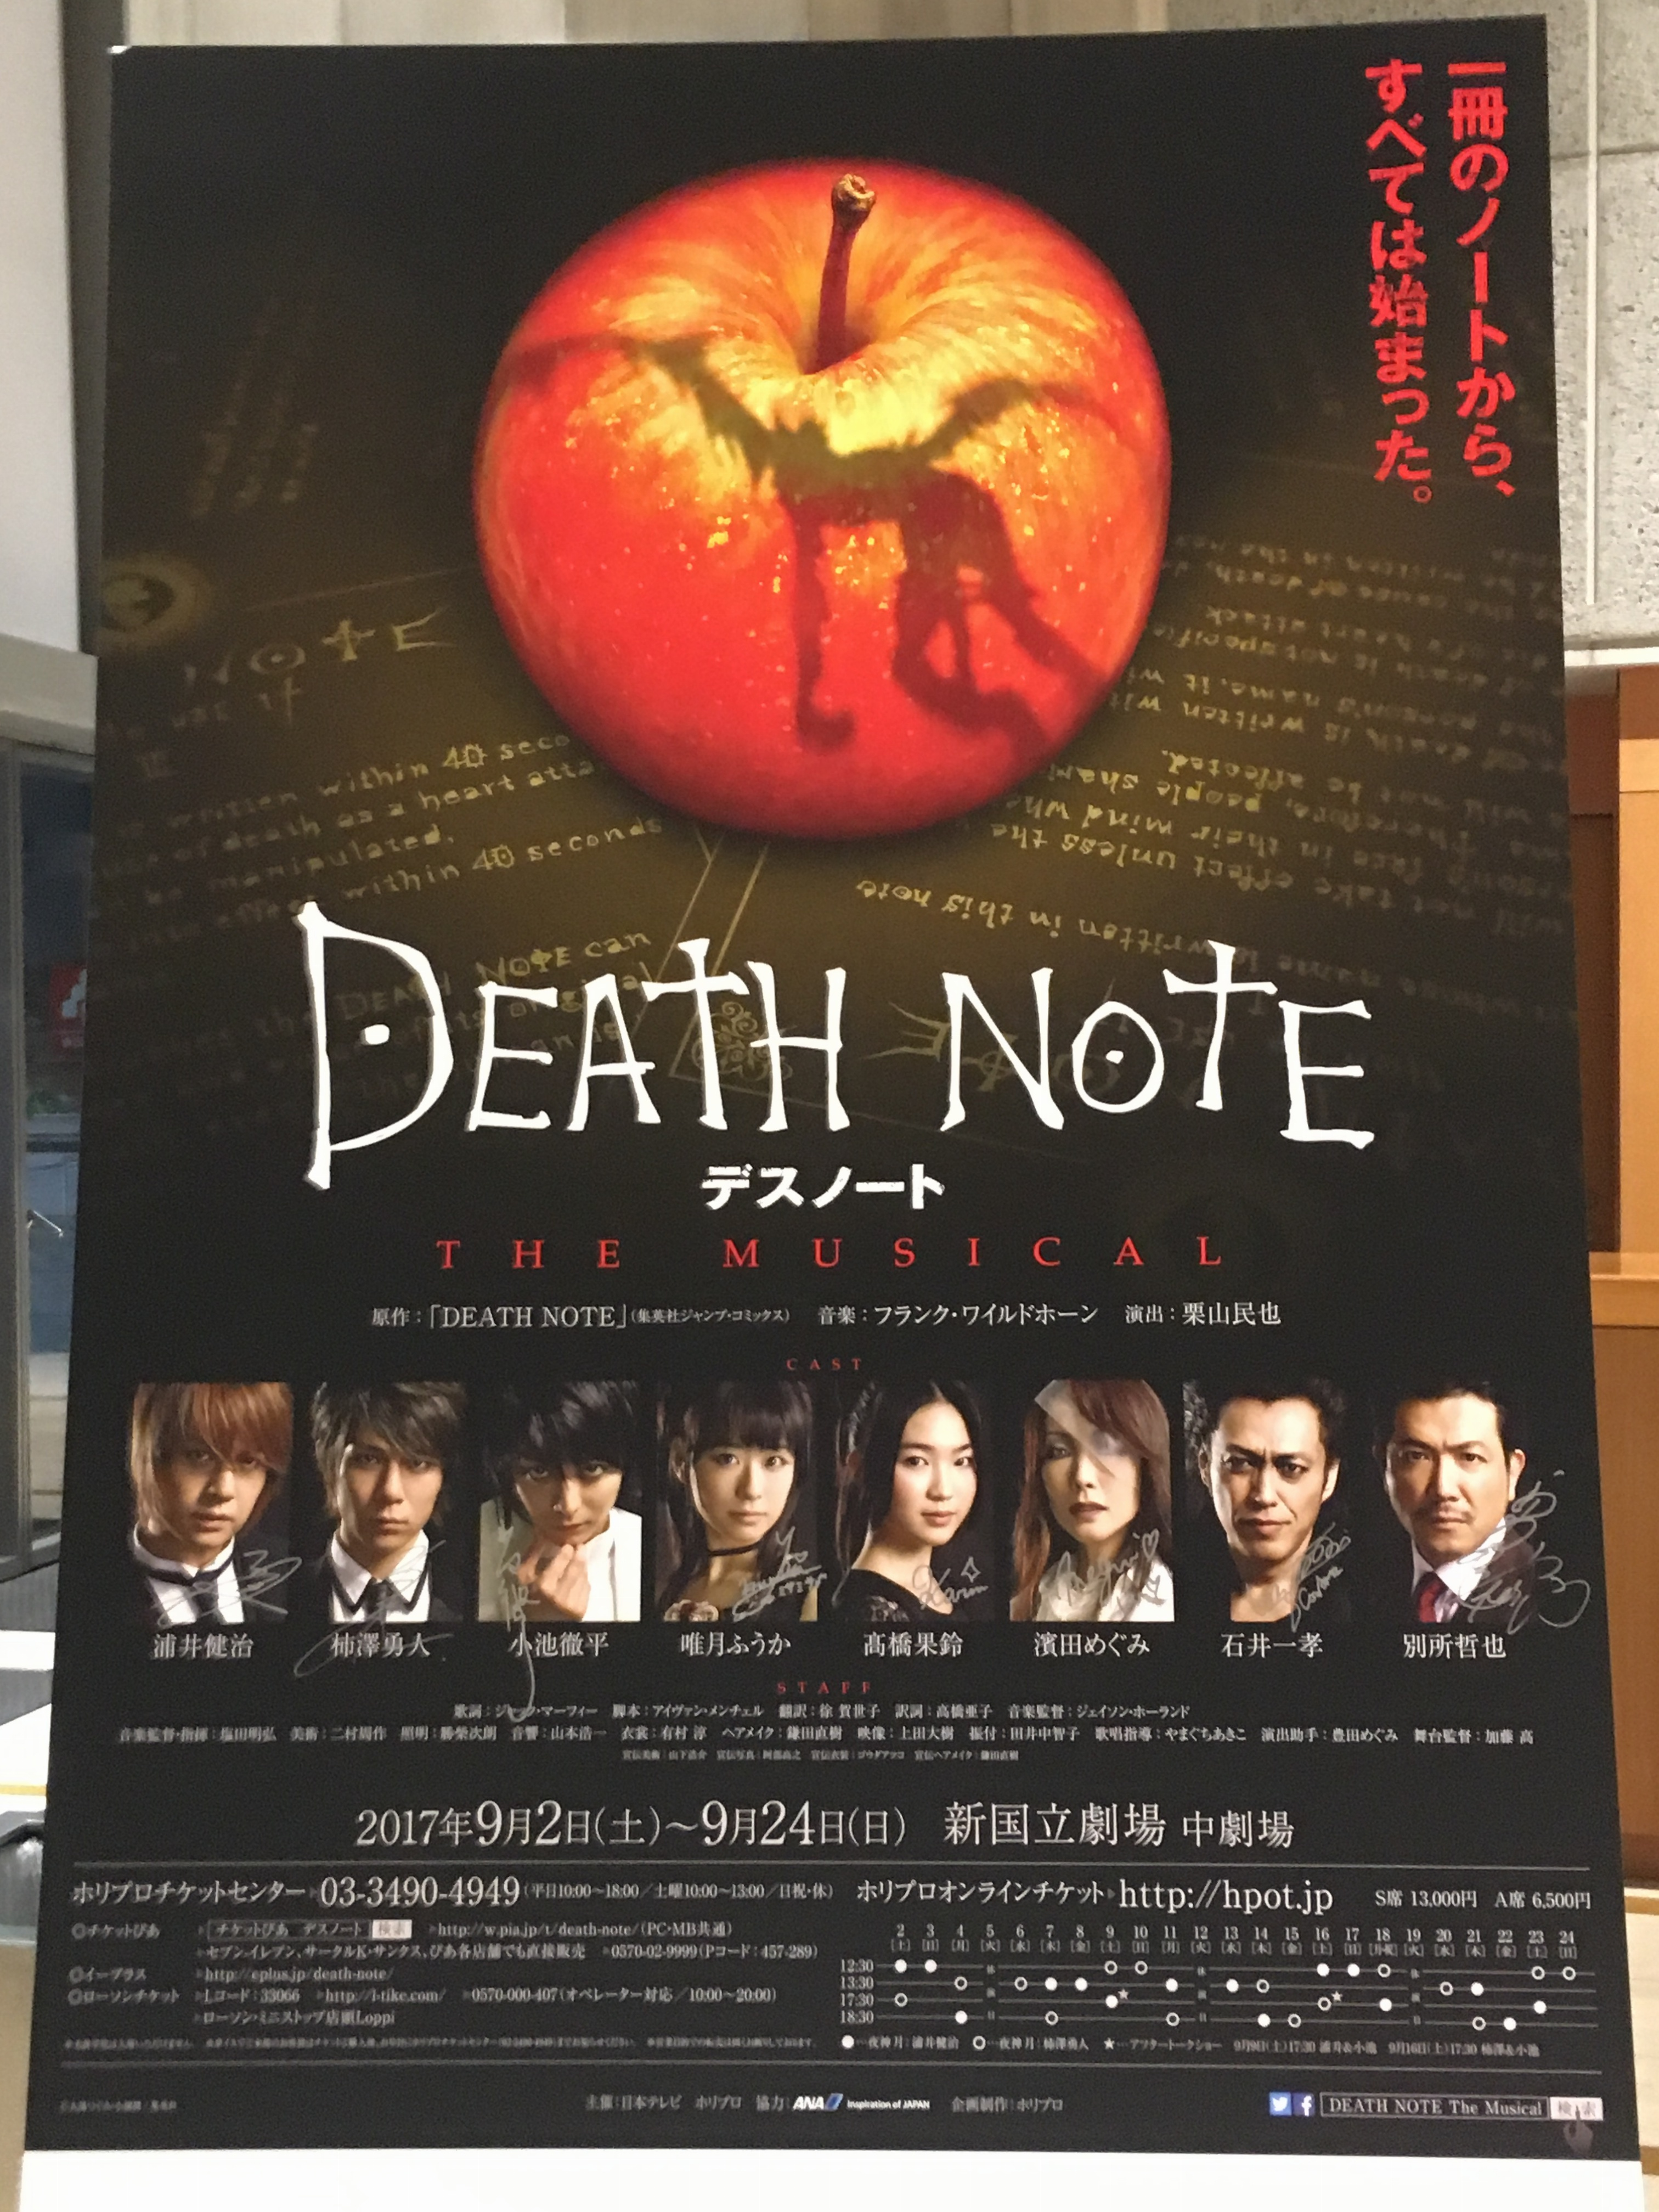 【DEATH NOTE THE MUSICAL】デスノートがミュージカルに!?待望の再演!!原作ファン、映画ファンからも大大大好評!_2